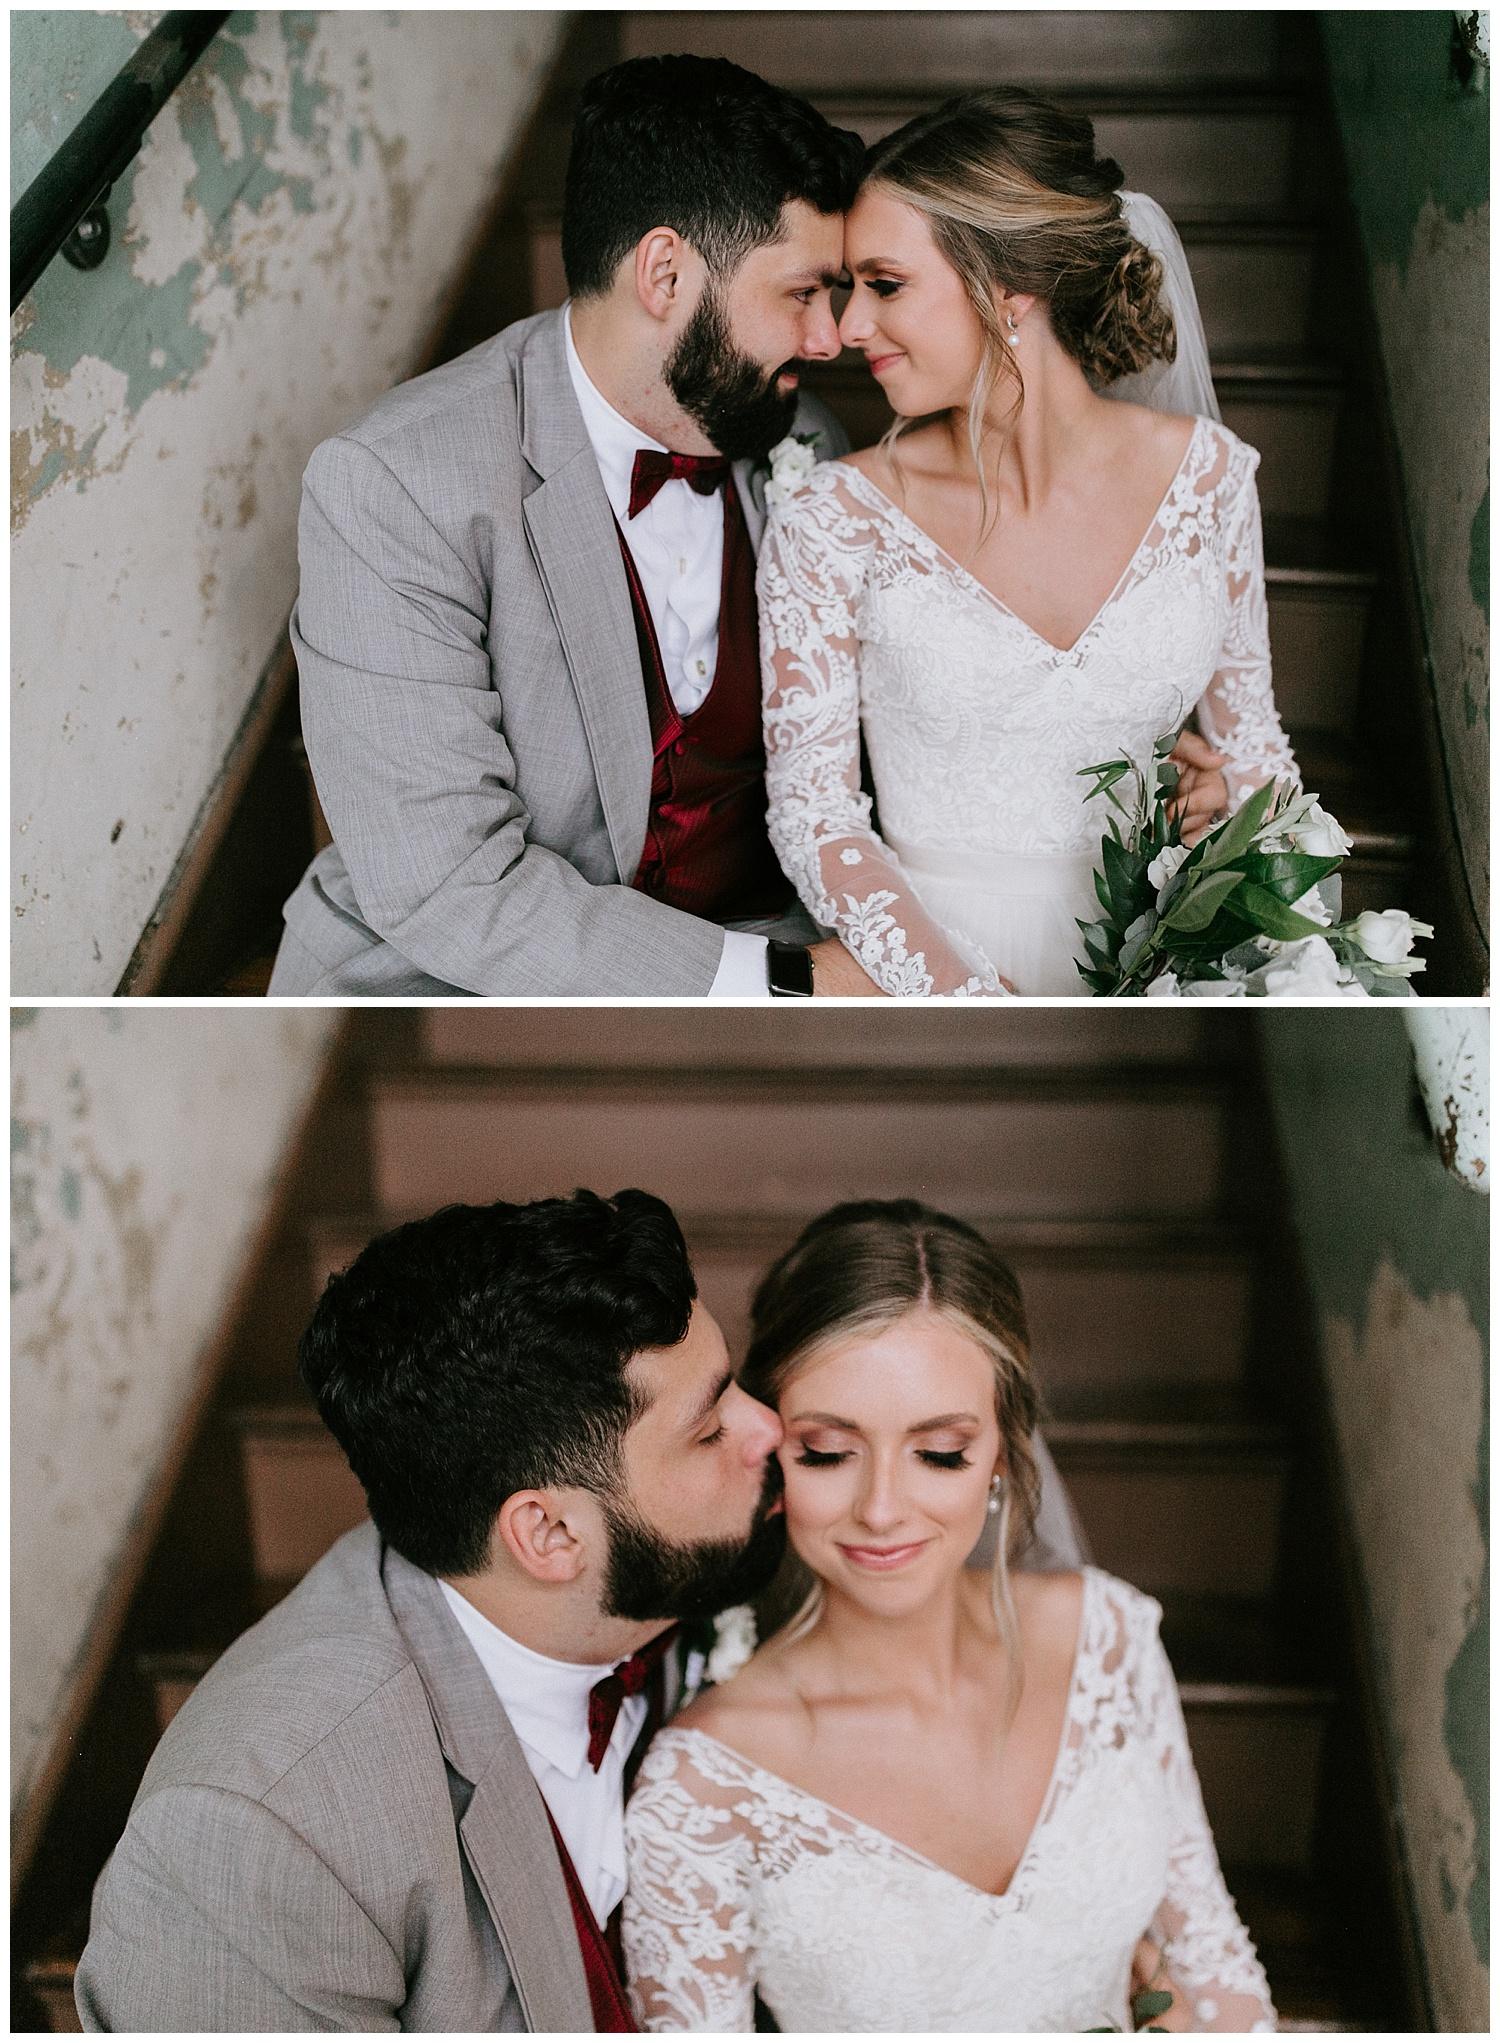 winter-wedding-the standard-knoxville_2019-01-23_0042.jpg